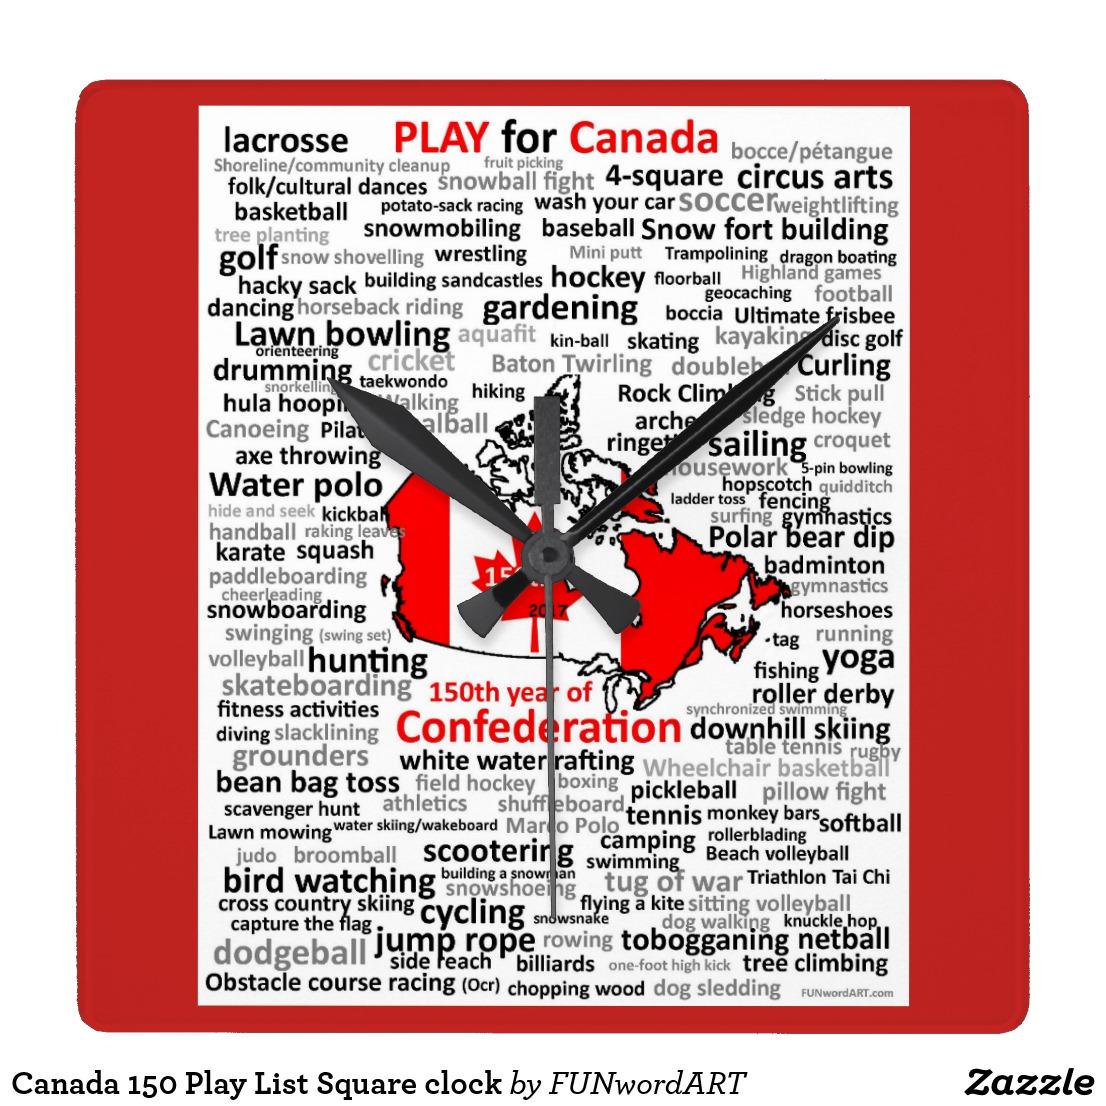 canada_150_play_list_square_clock